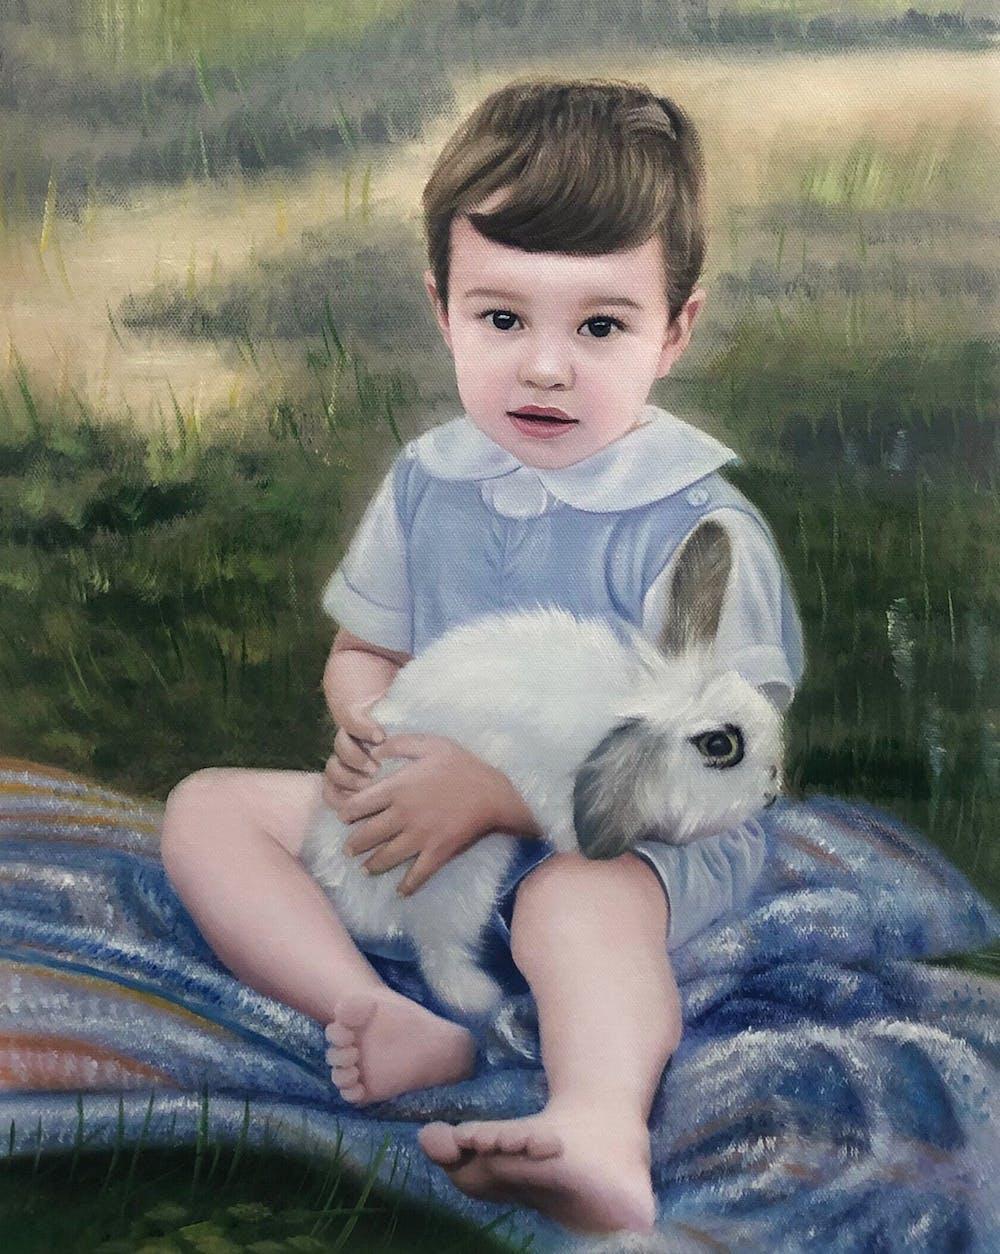 Artist-Rendered Painting